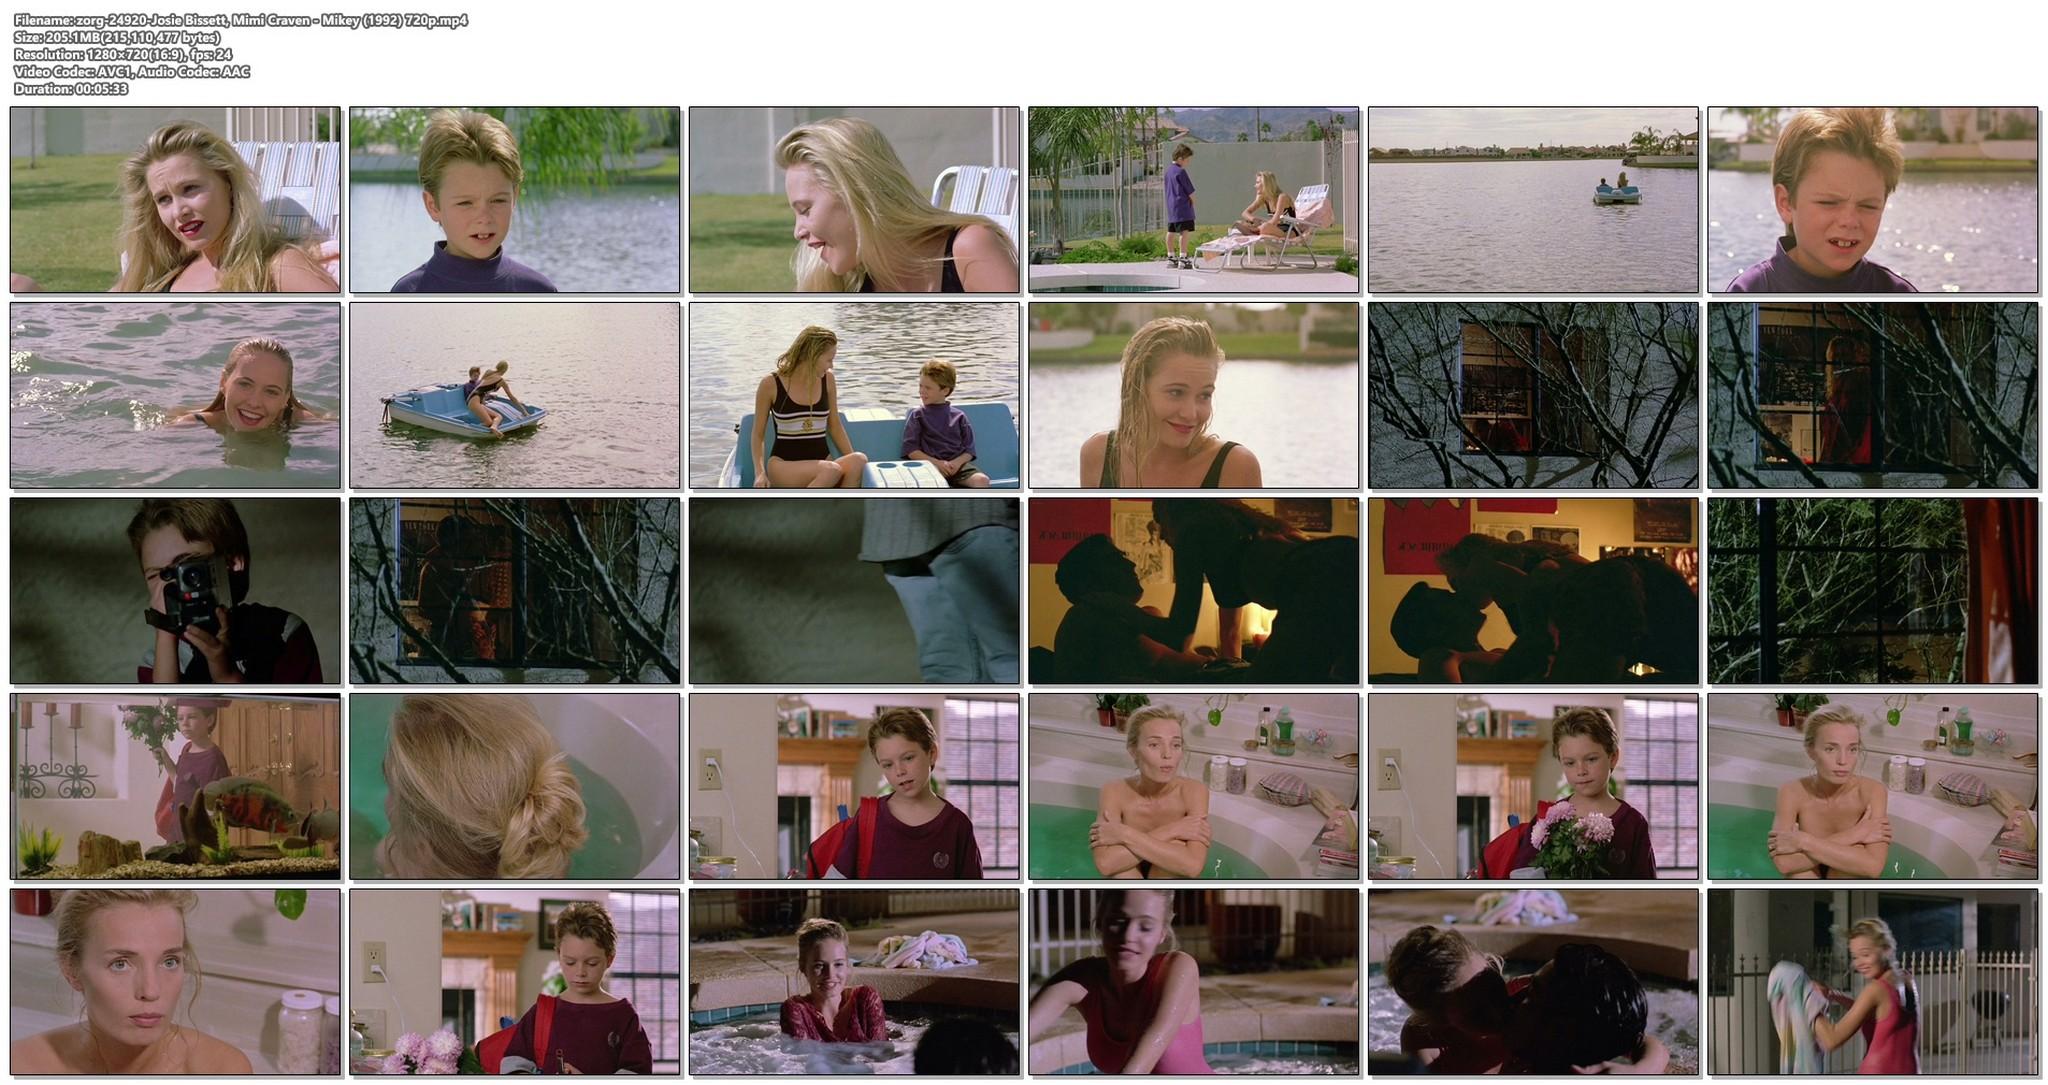 Josie Bissett sexy Mimi Craven nude topless Mikey 1992 720p 16